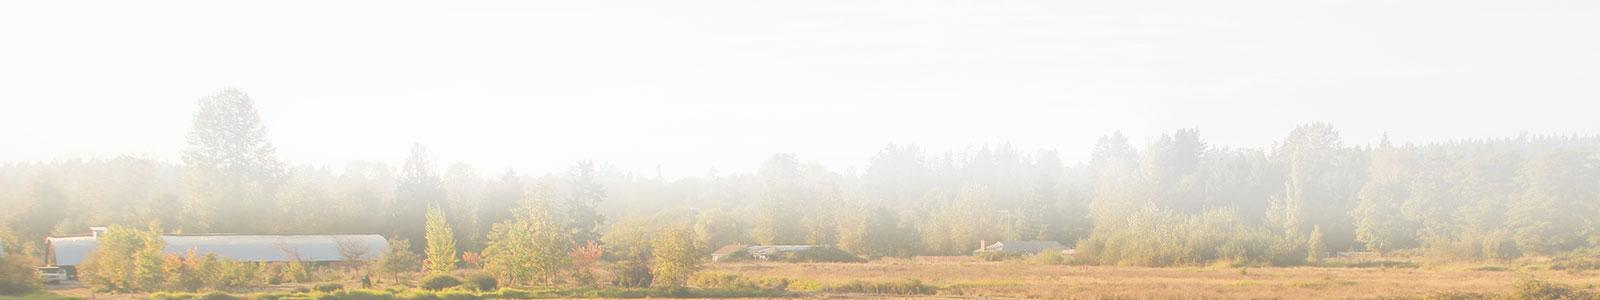 farm header image